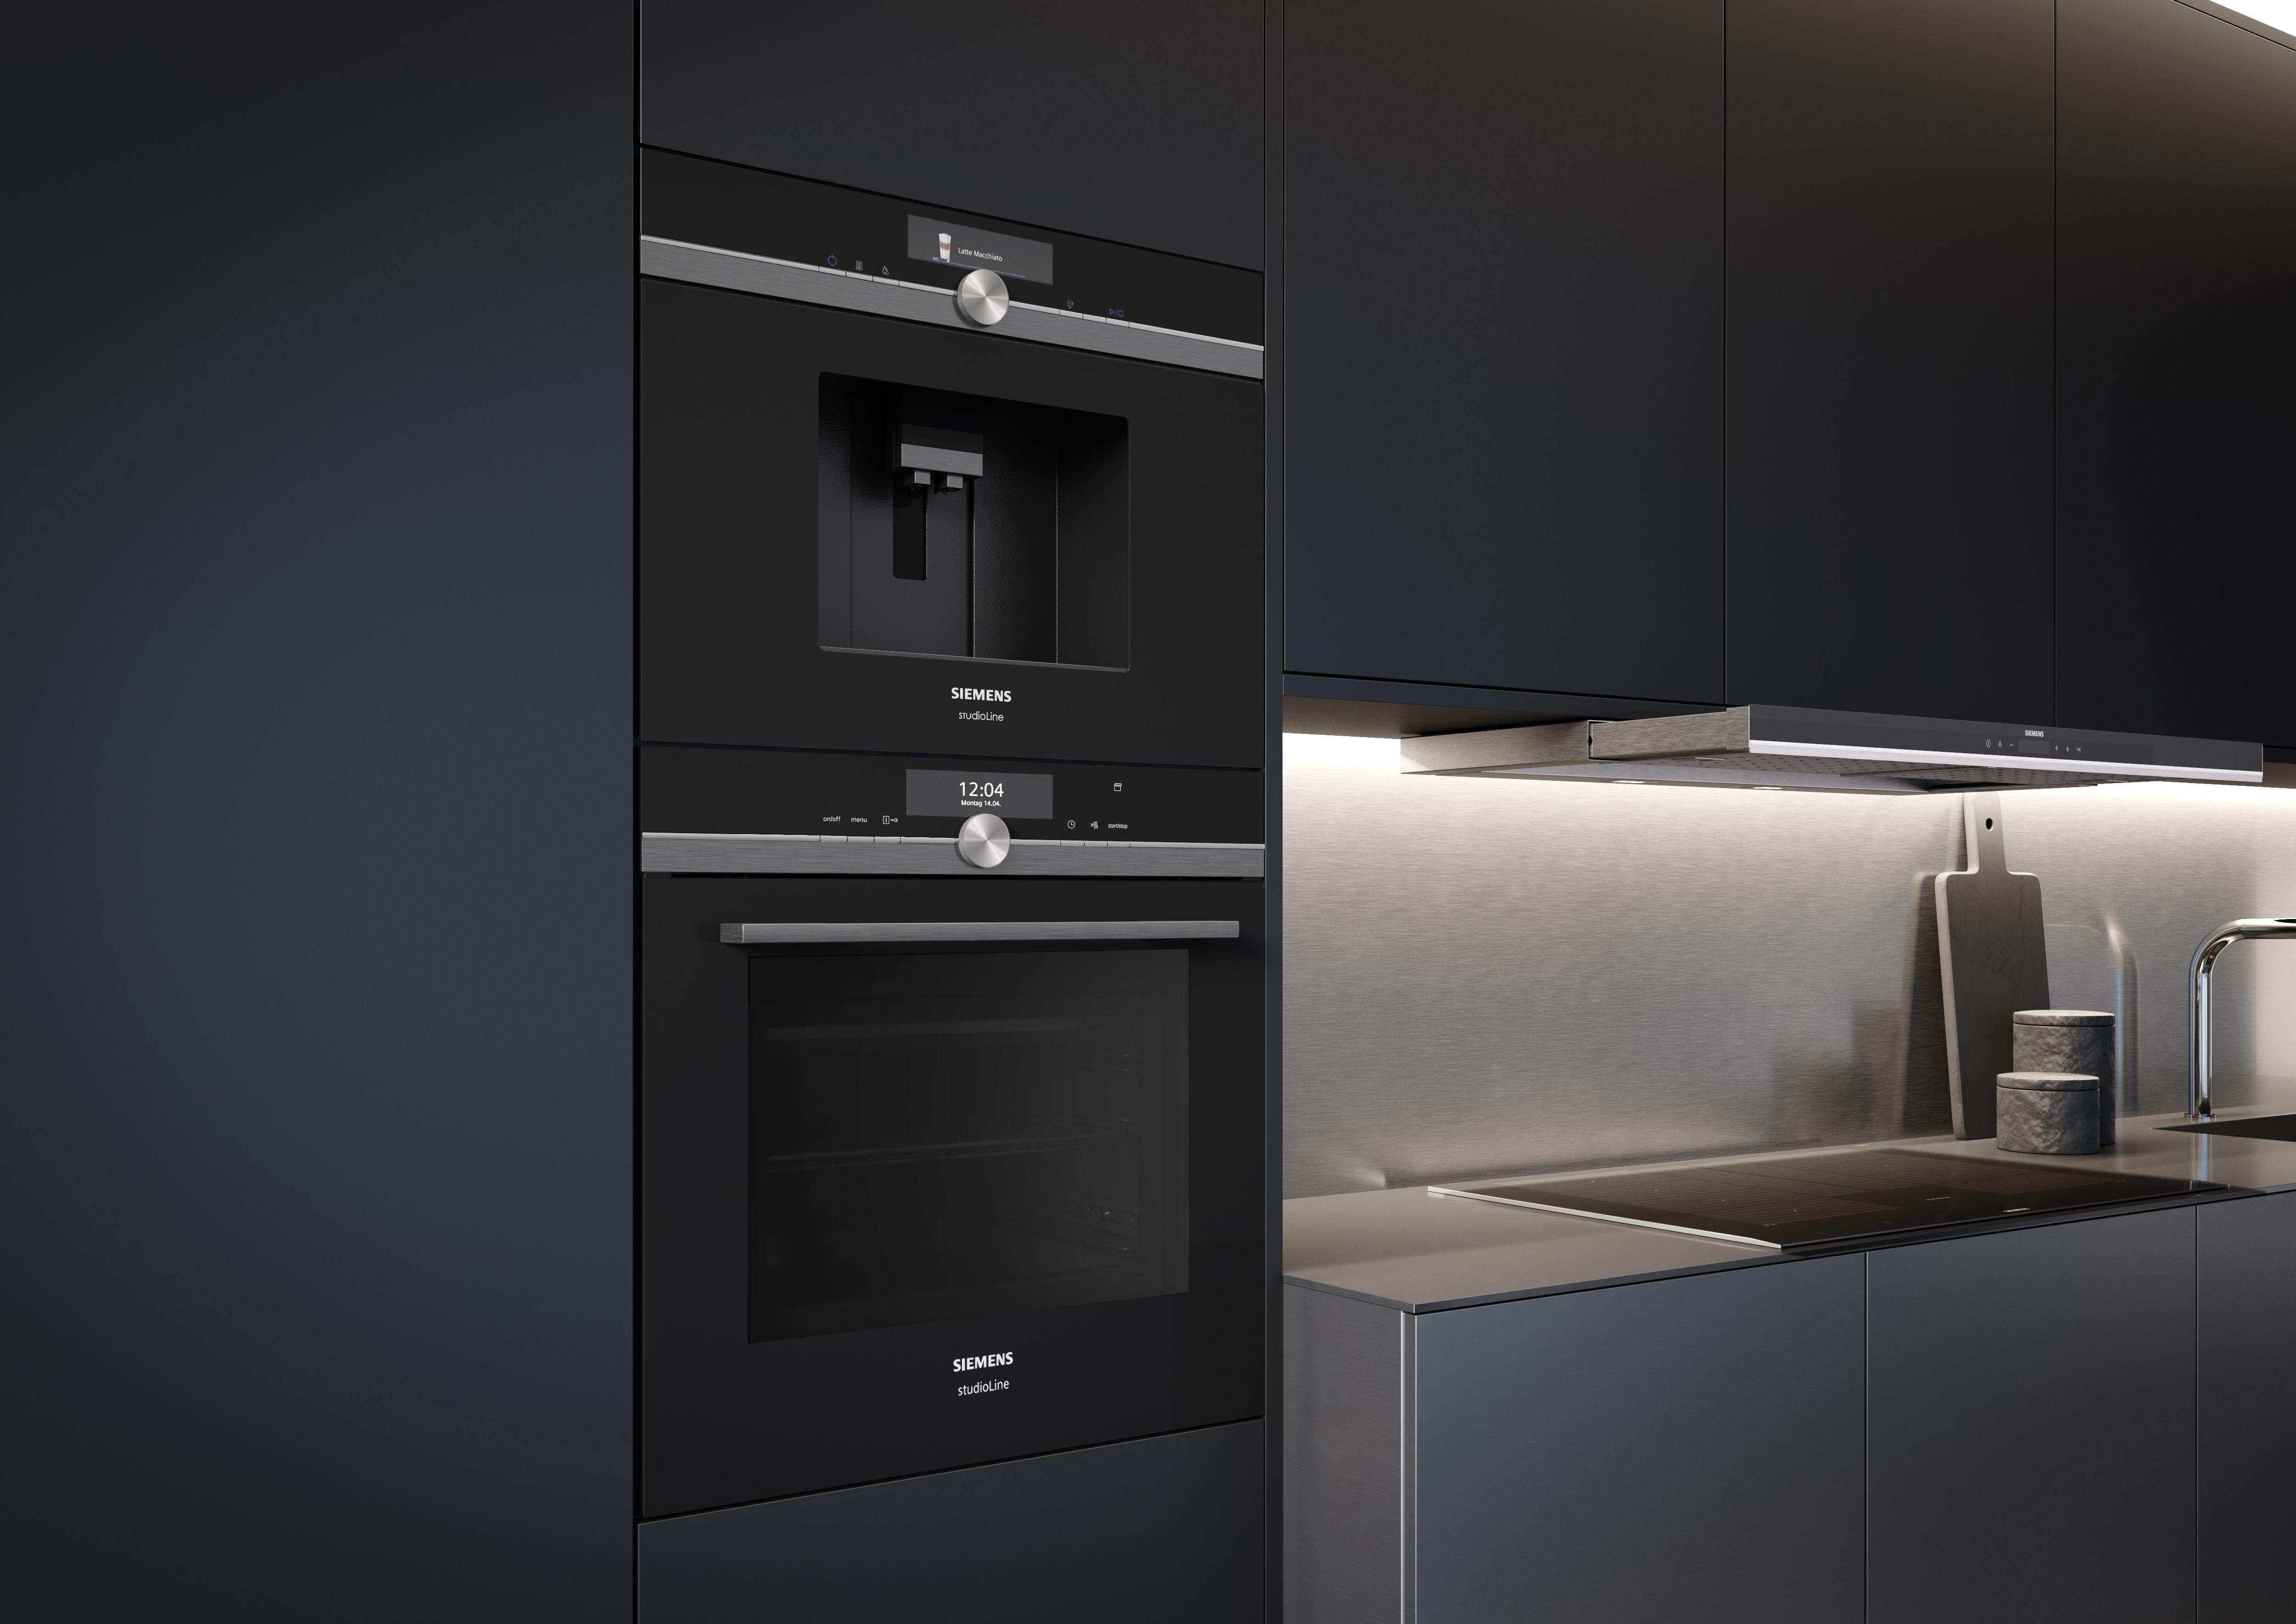 Siemens Built-In Ovens  Kitchen room design, Built in ovens